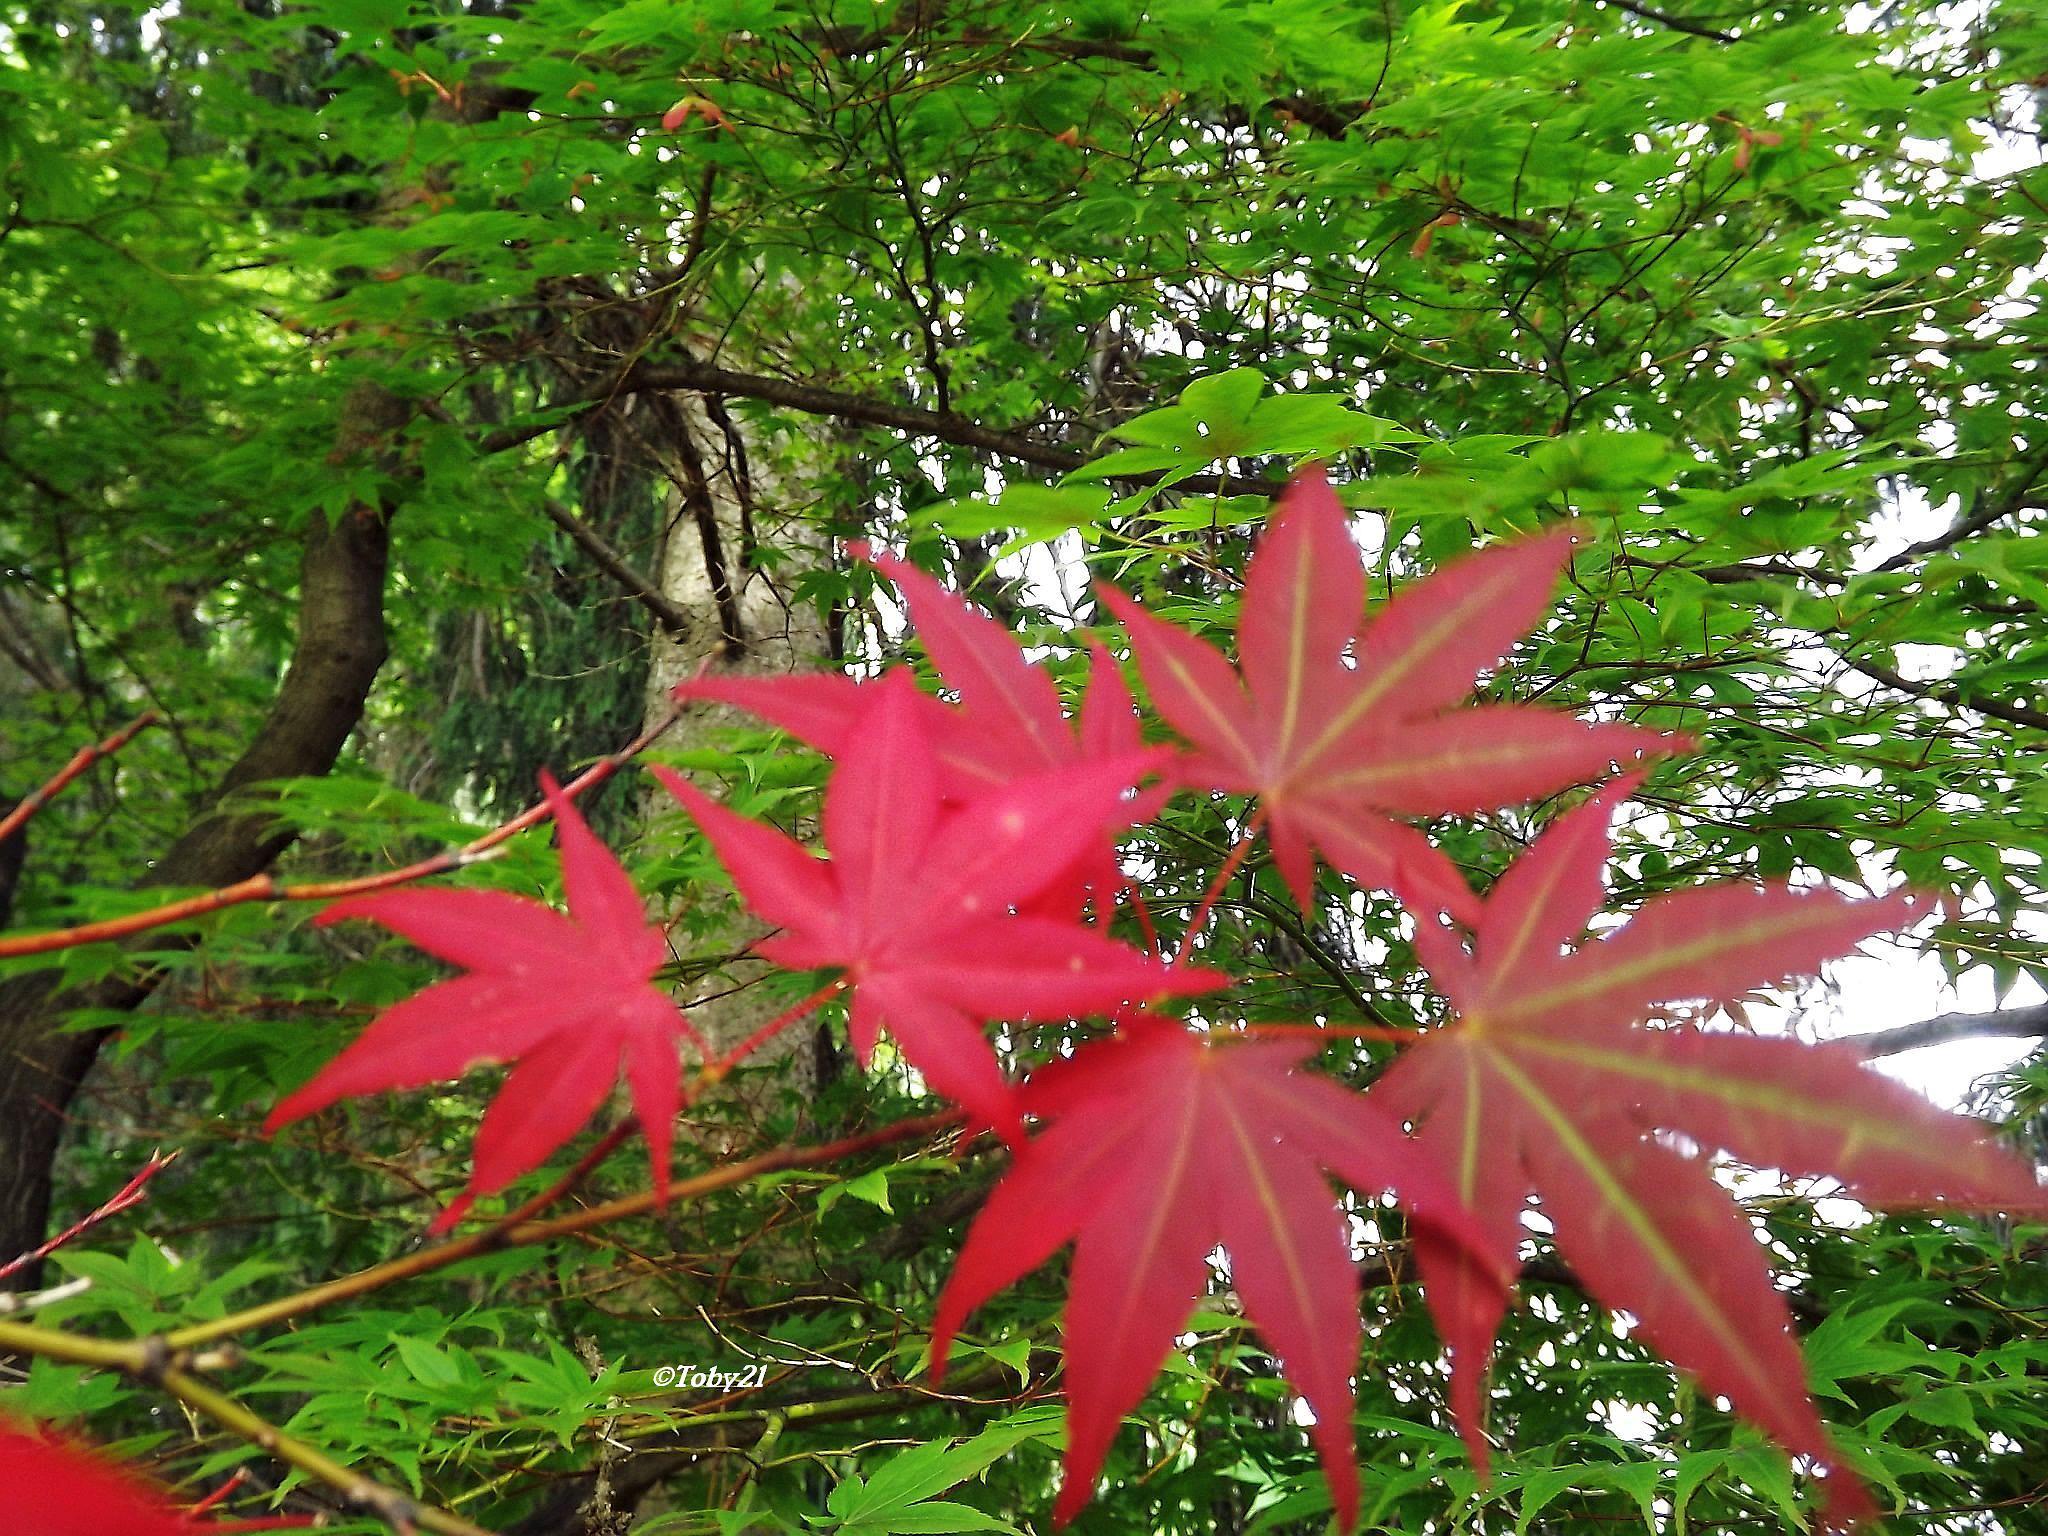 canadian maple tree by b.xoxoxo